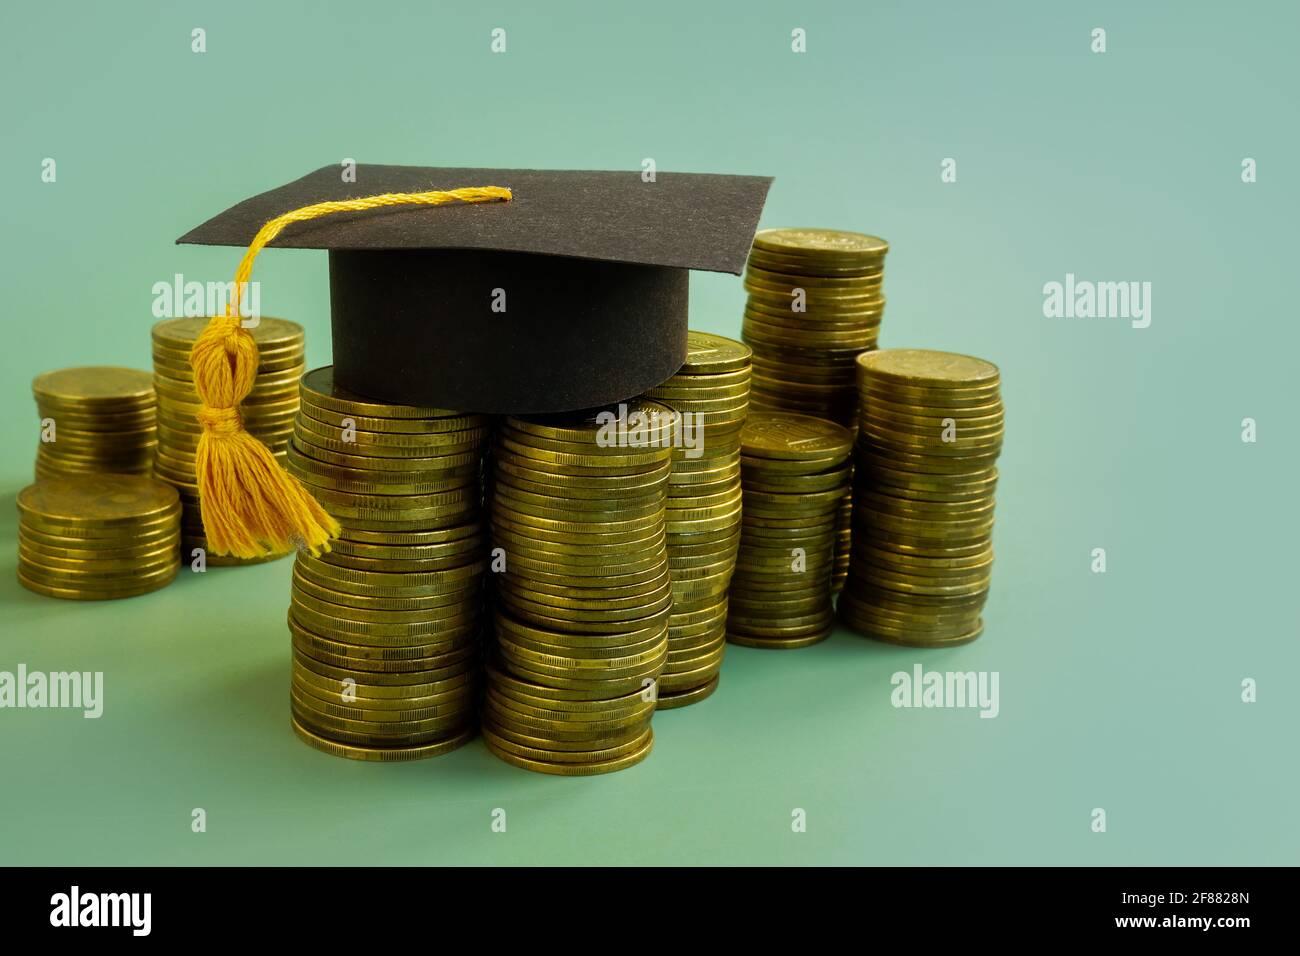 Savings for education concept. Graduation cap and money. Stock Photo